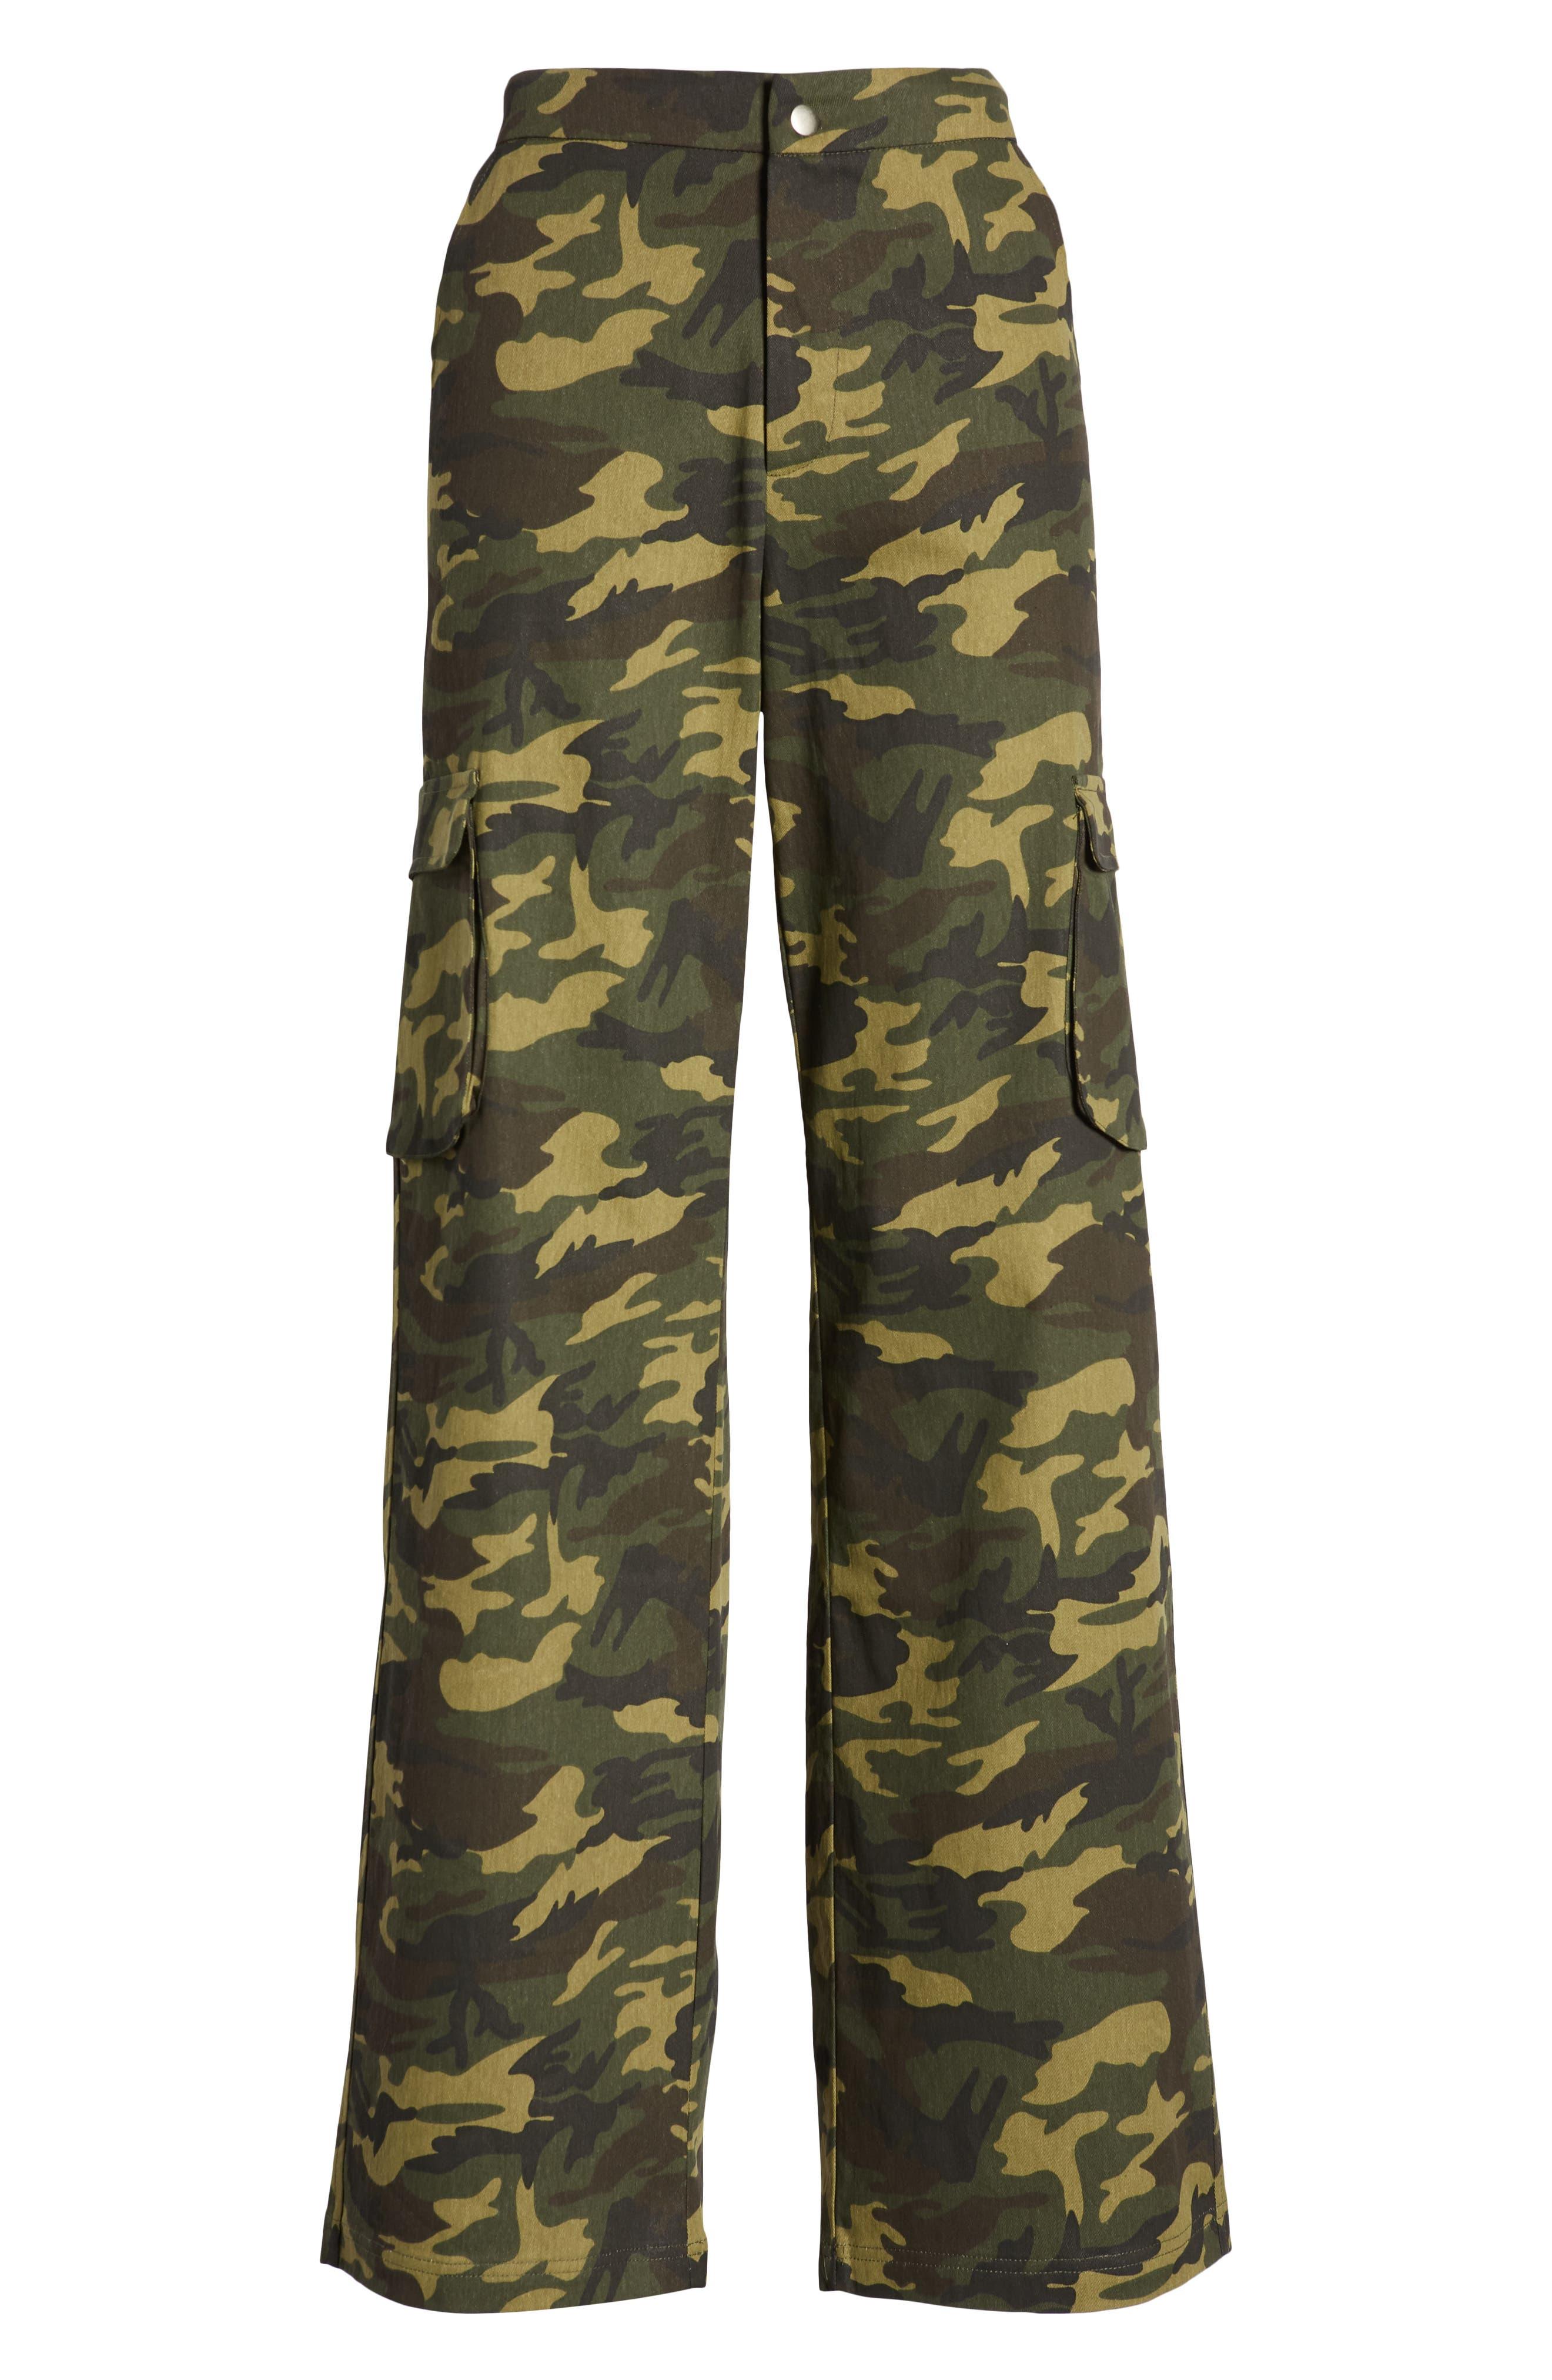 Keegan High Waist Straight Leg Pants,                             Alternate thumbnail 7, color,                             GREEN CAMO